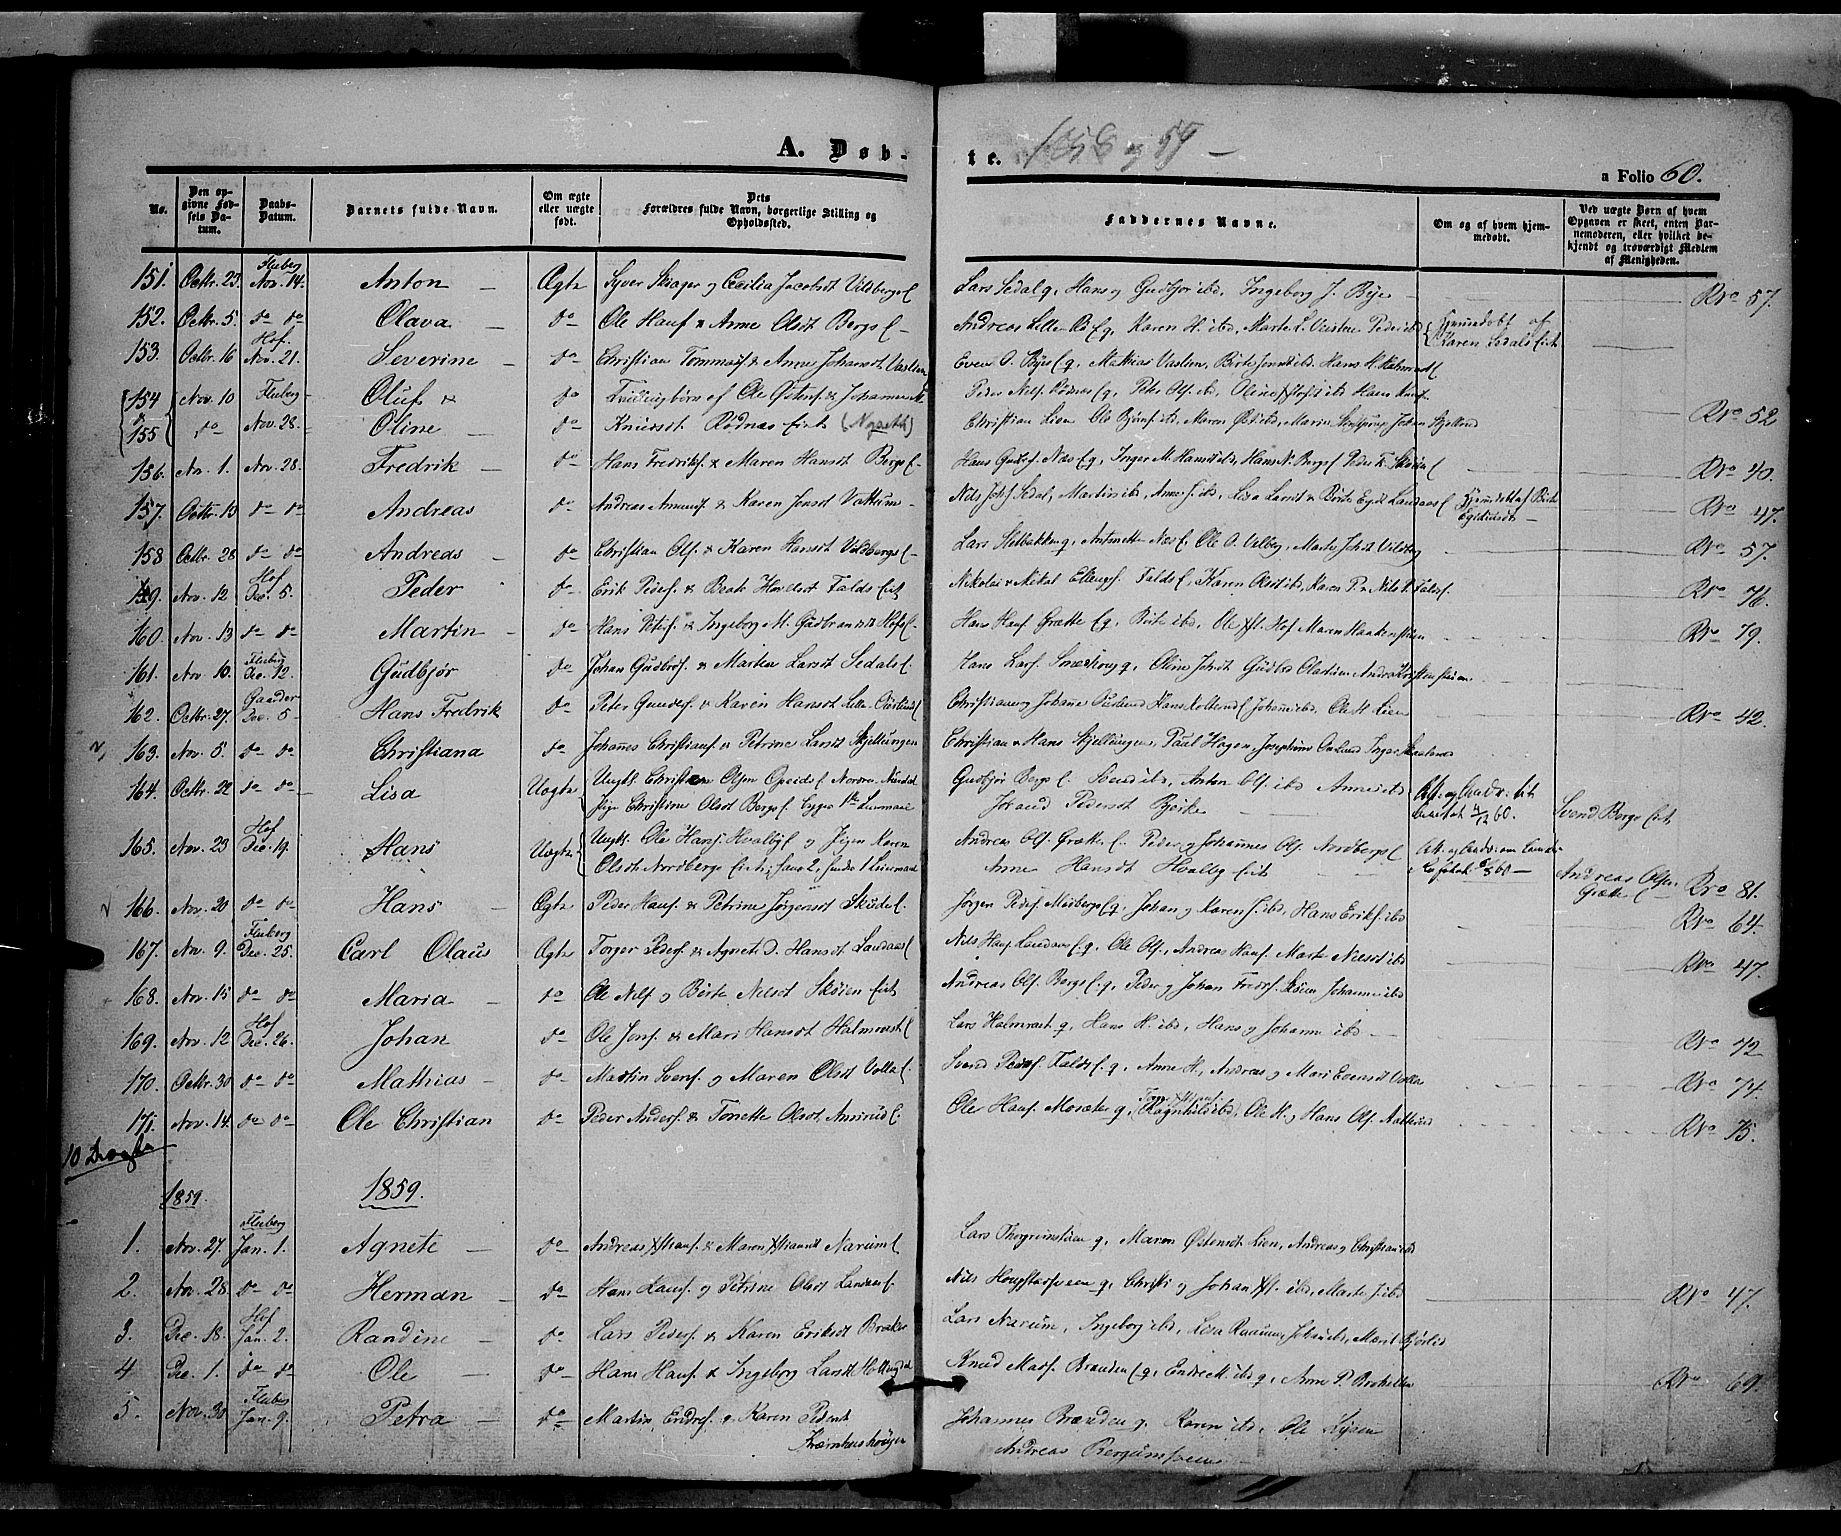 SAH, Land prestekontor, Ministerialbok nr. 9, 1847-1859, s. 60